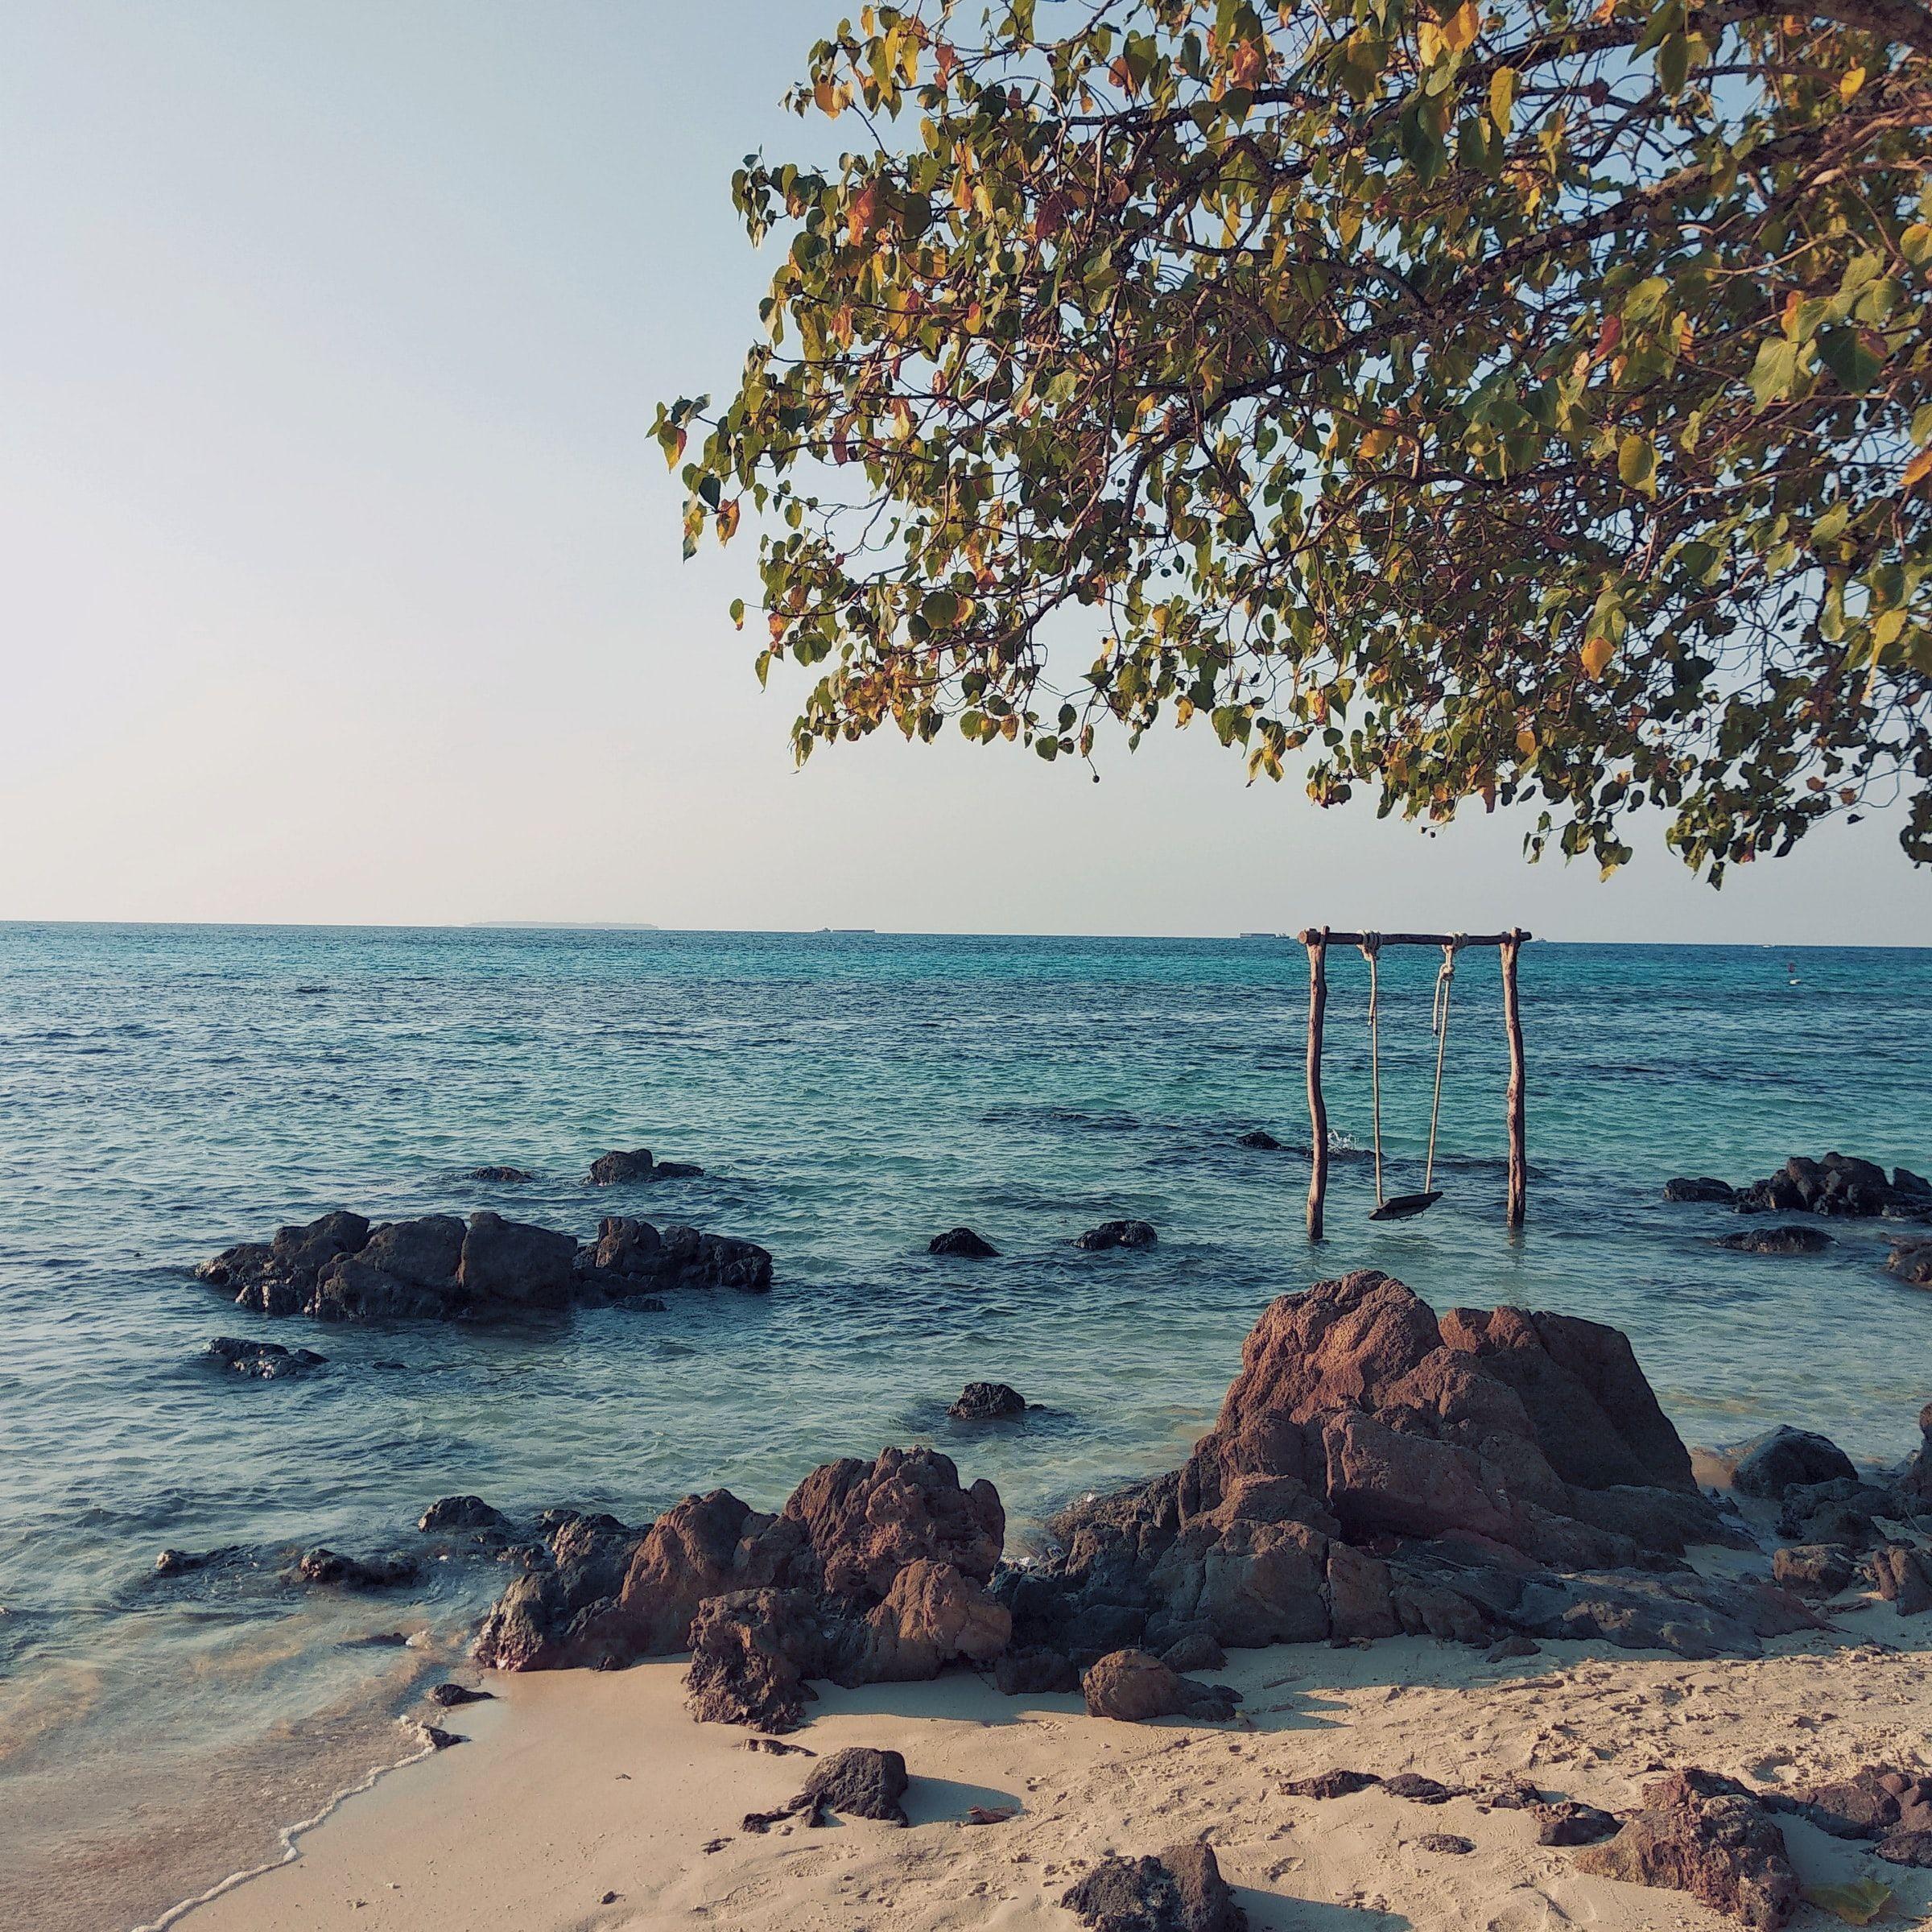 Pantai Anora Karimunjawa Indonesia